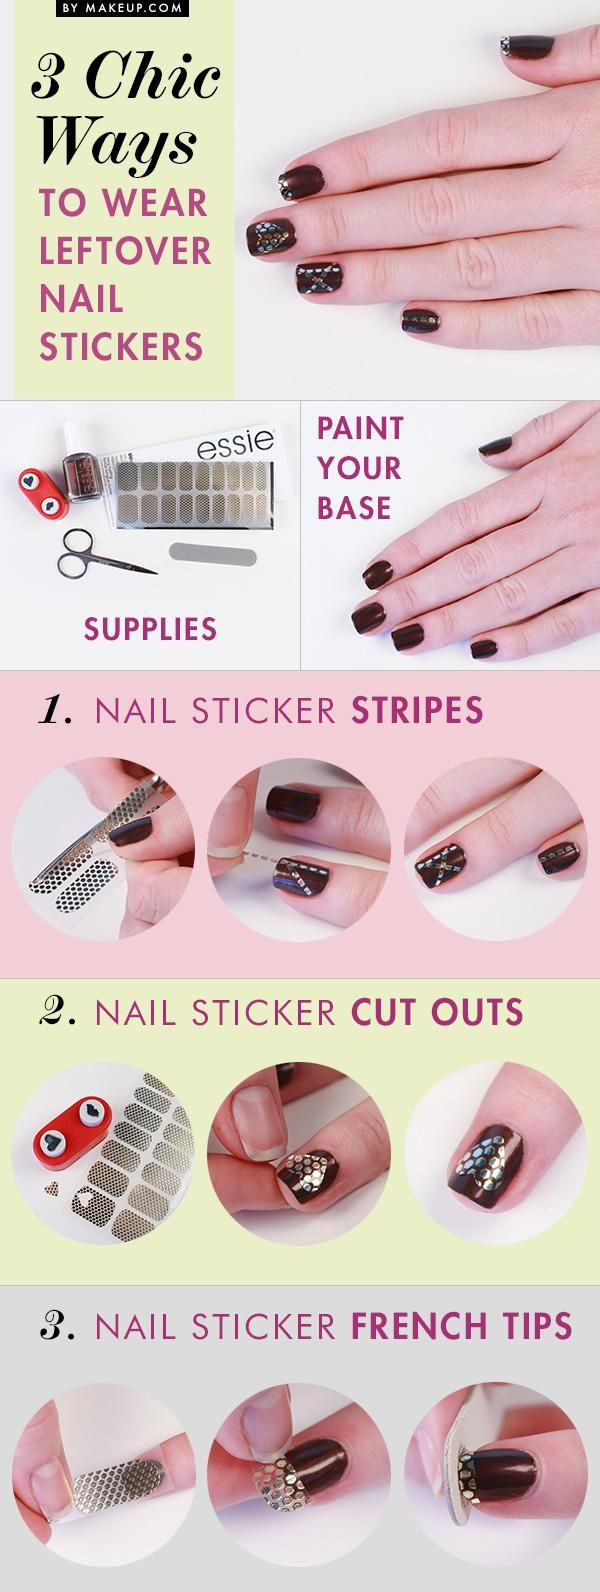 New ideas! Jamberry nails https://kellyjohnson64.jamberry.com/profile/